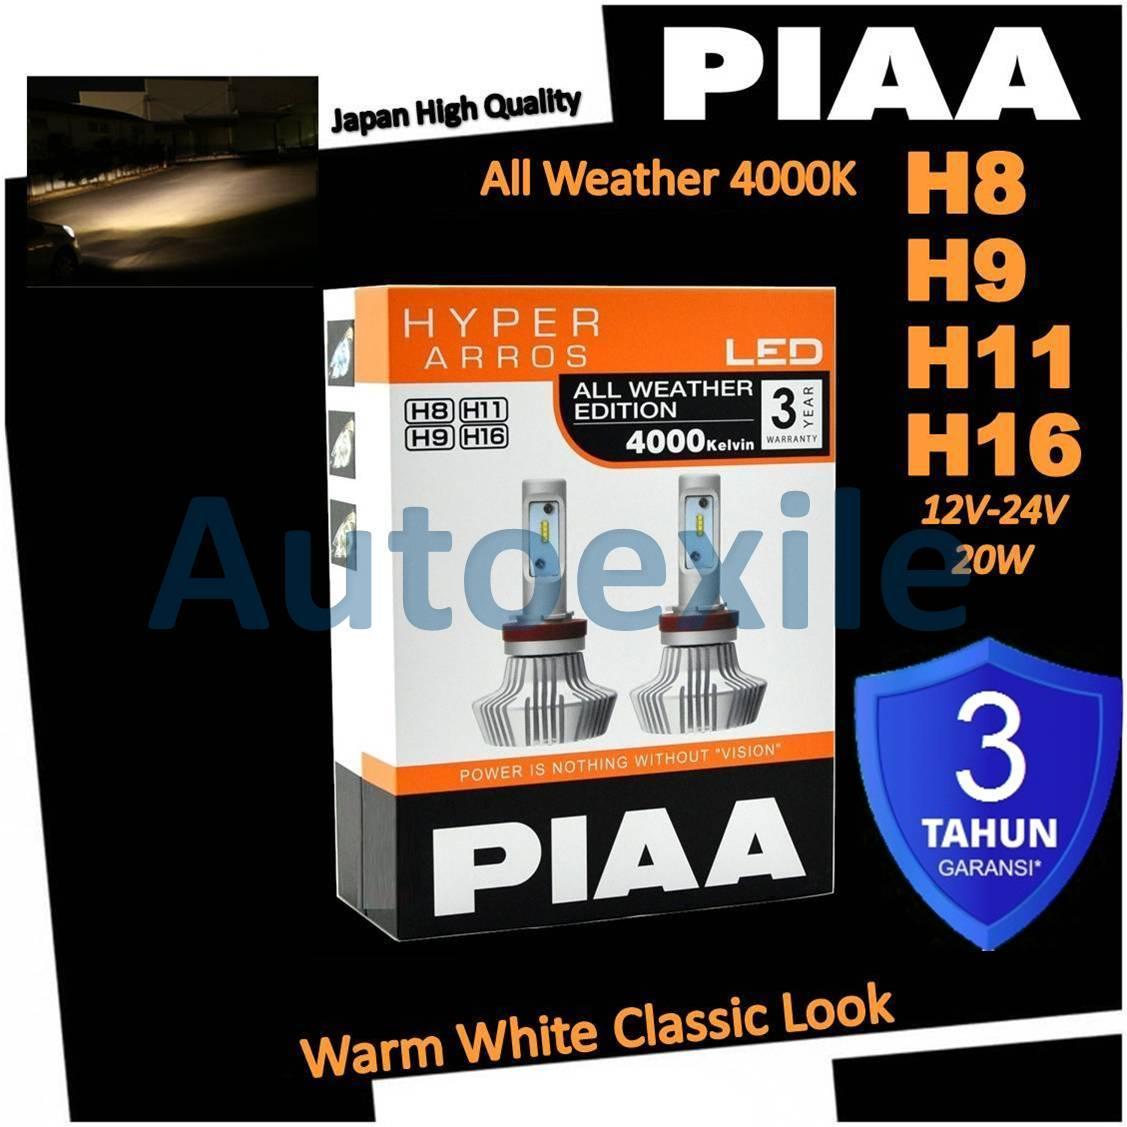 PIAA LEH132E Hyper Arros LED All Weather H8 H9 H11 H16 4000K Warm White Putih Kekuningan Lampu Mobil Agya Ayla Xpander Pajero Sport Fortuner VRZ Avanza Veloz Innova Reborn HRV  Camry Ertiga Rush Rav4 Prius Land Cruiser Outlander